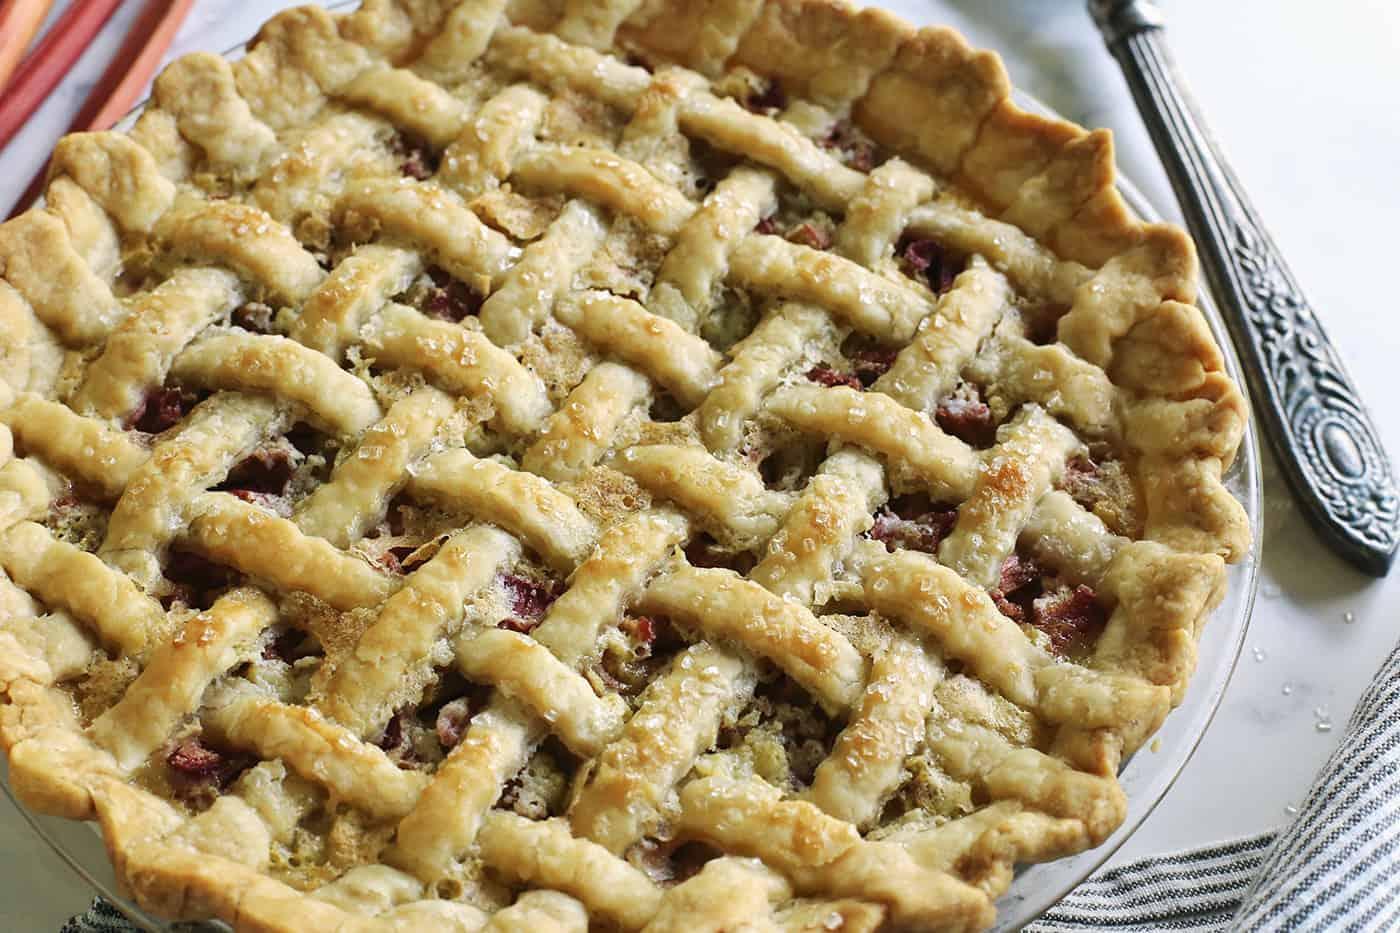 baked rhubarb and custard pie